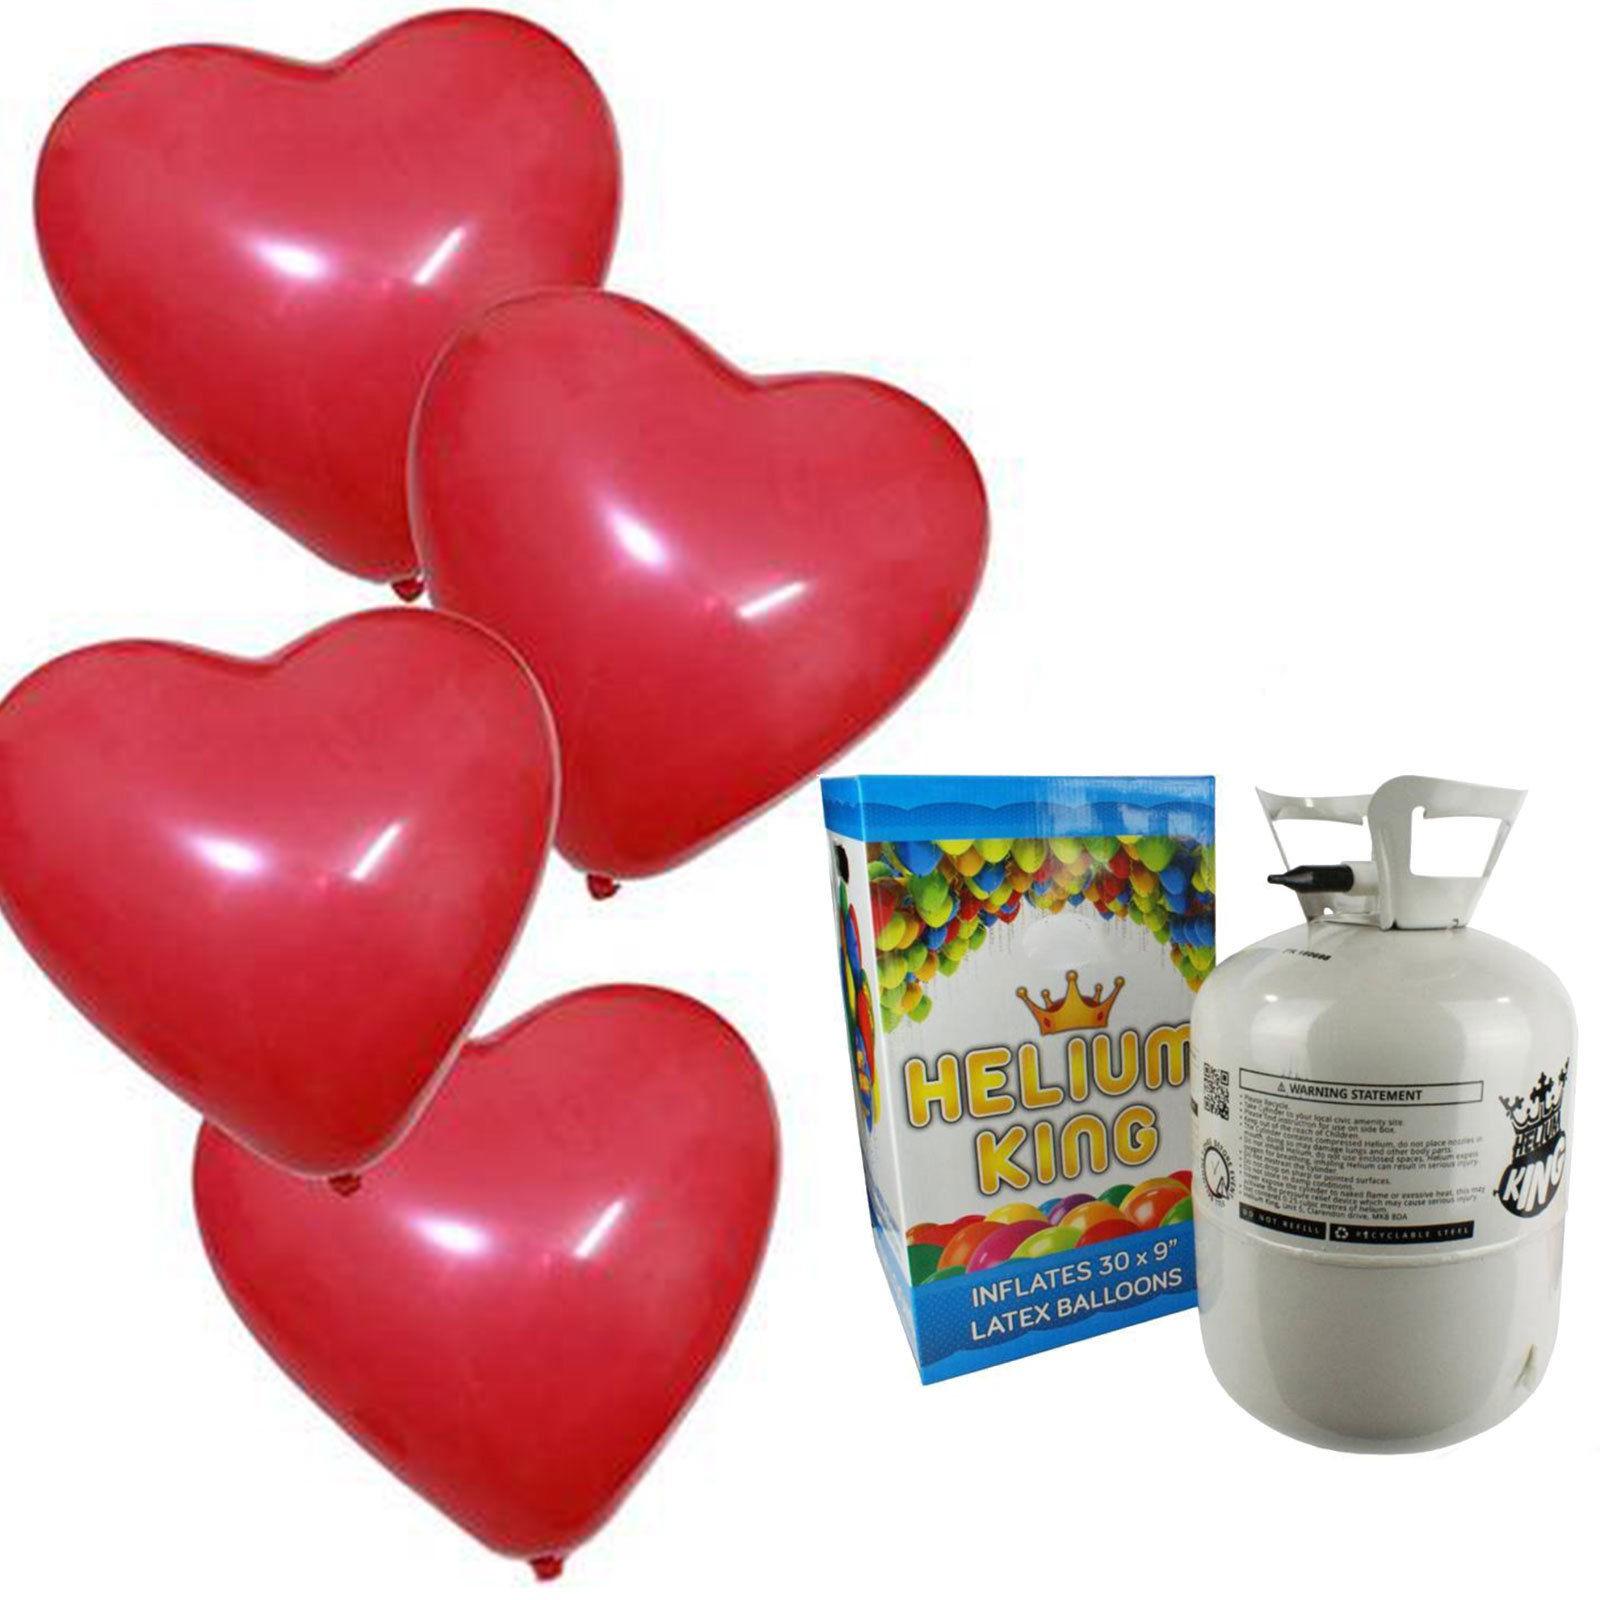 helium gas ballongas tank luftballons party folienballons. Black Bedroom Furniture Sets. Home Design Ideas